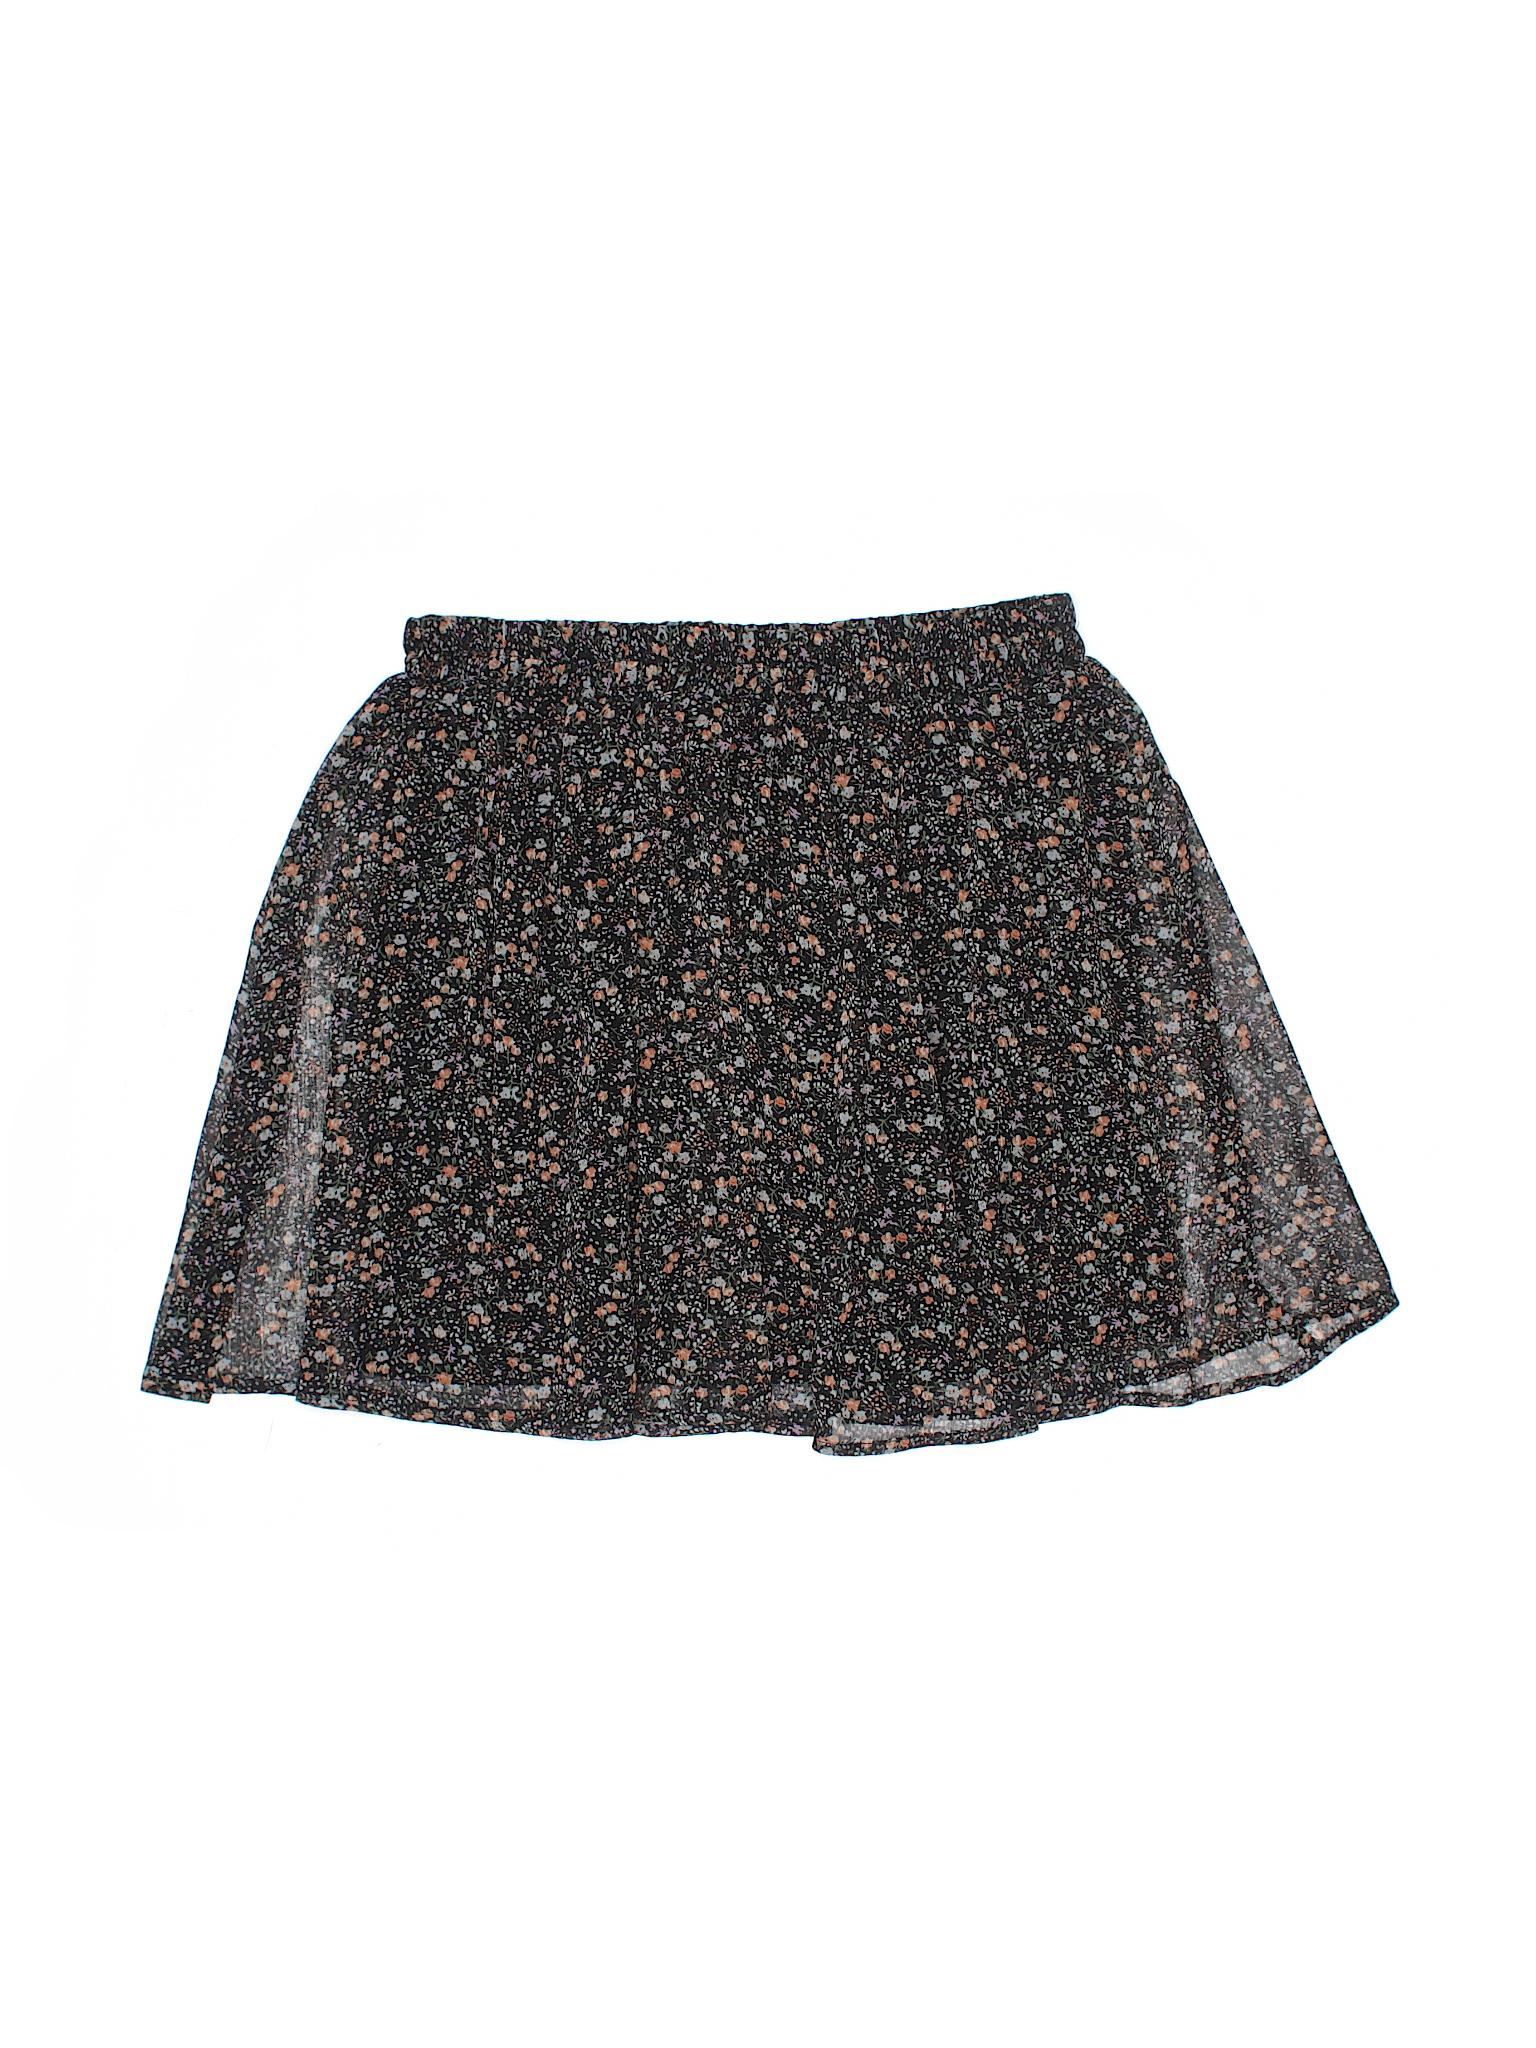 21 21 Forever Boutique Boutique Forever Boutique Casual Skirt Forever Skirt Casual Casual 21 wZfCHvvq